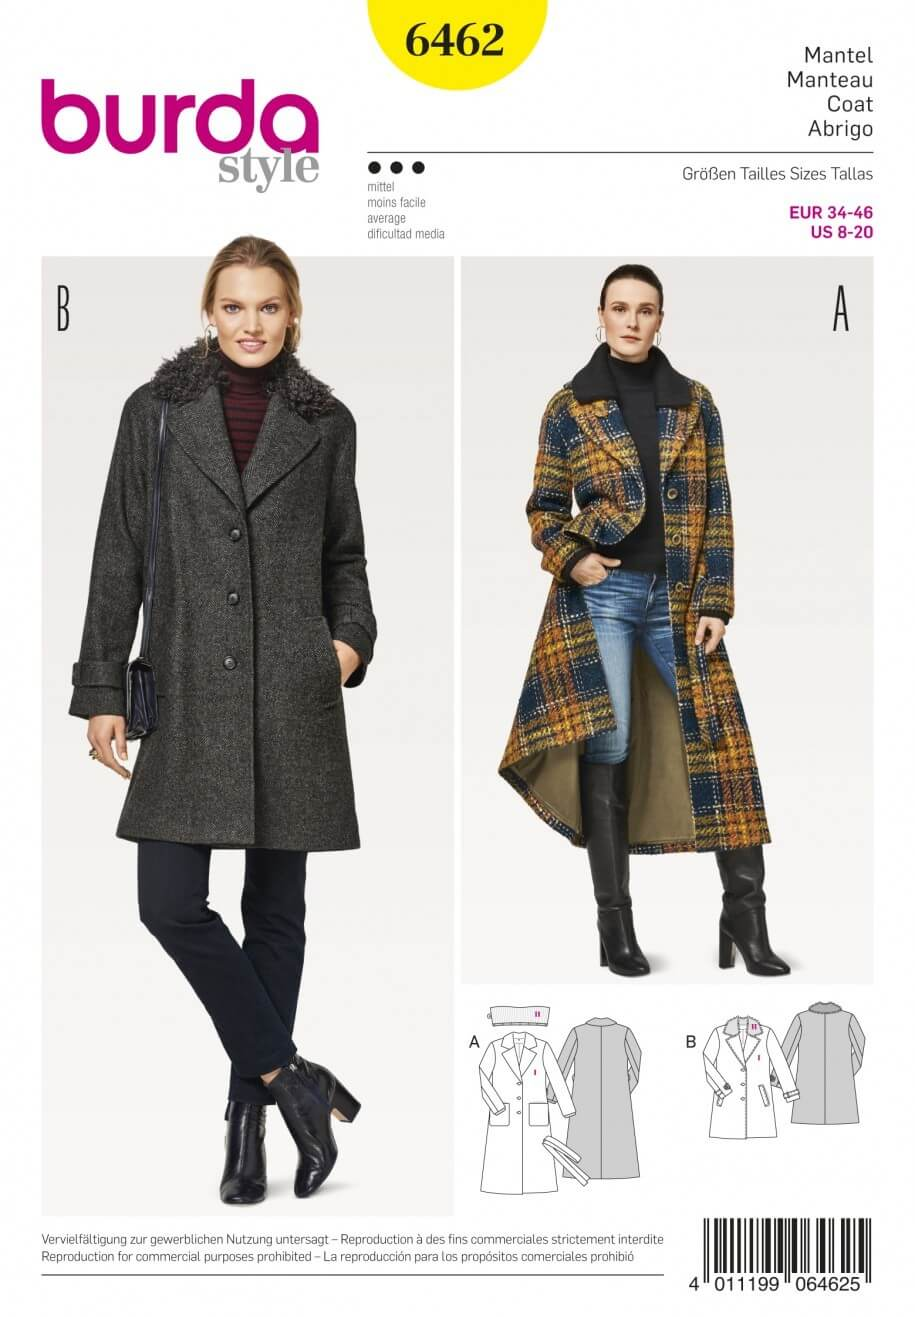 Burda Style Women's Fur Collar Blazer Coat Dress Sewing Pattern 6462